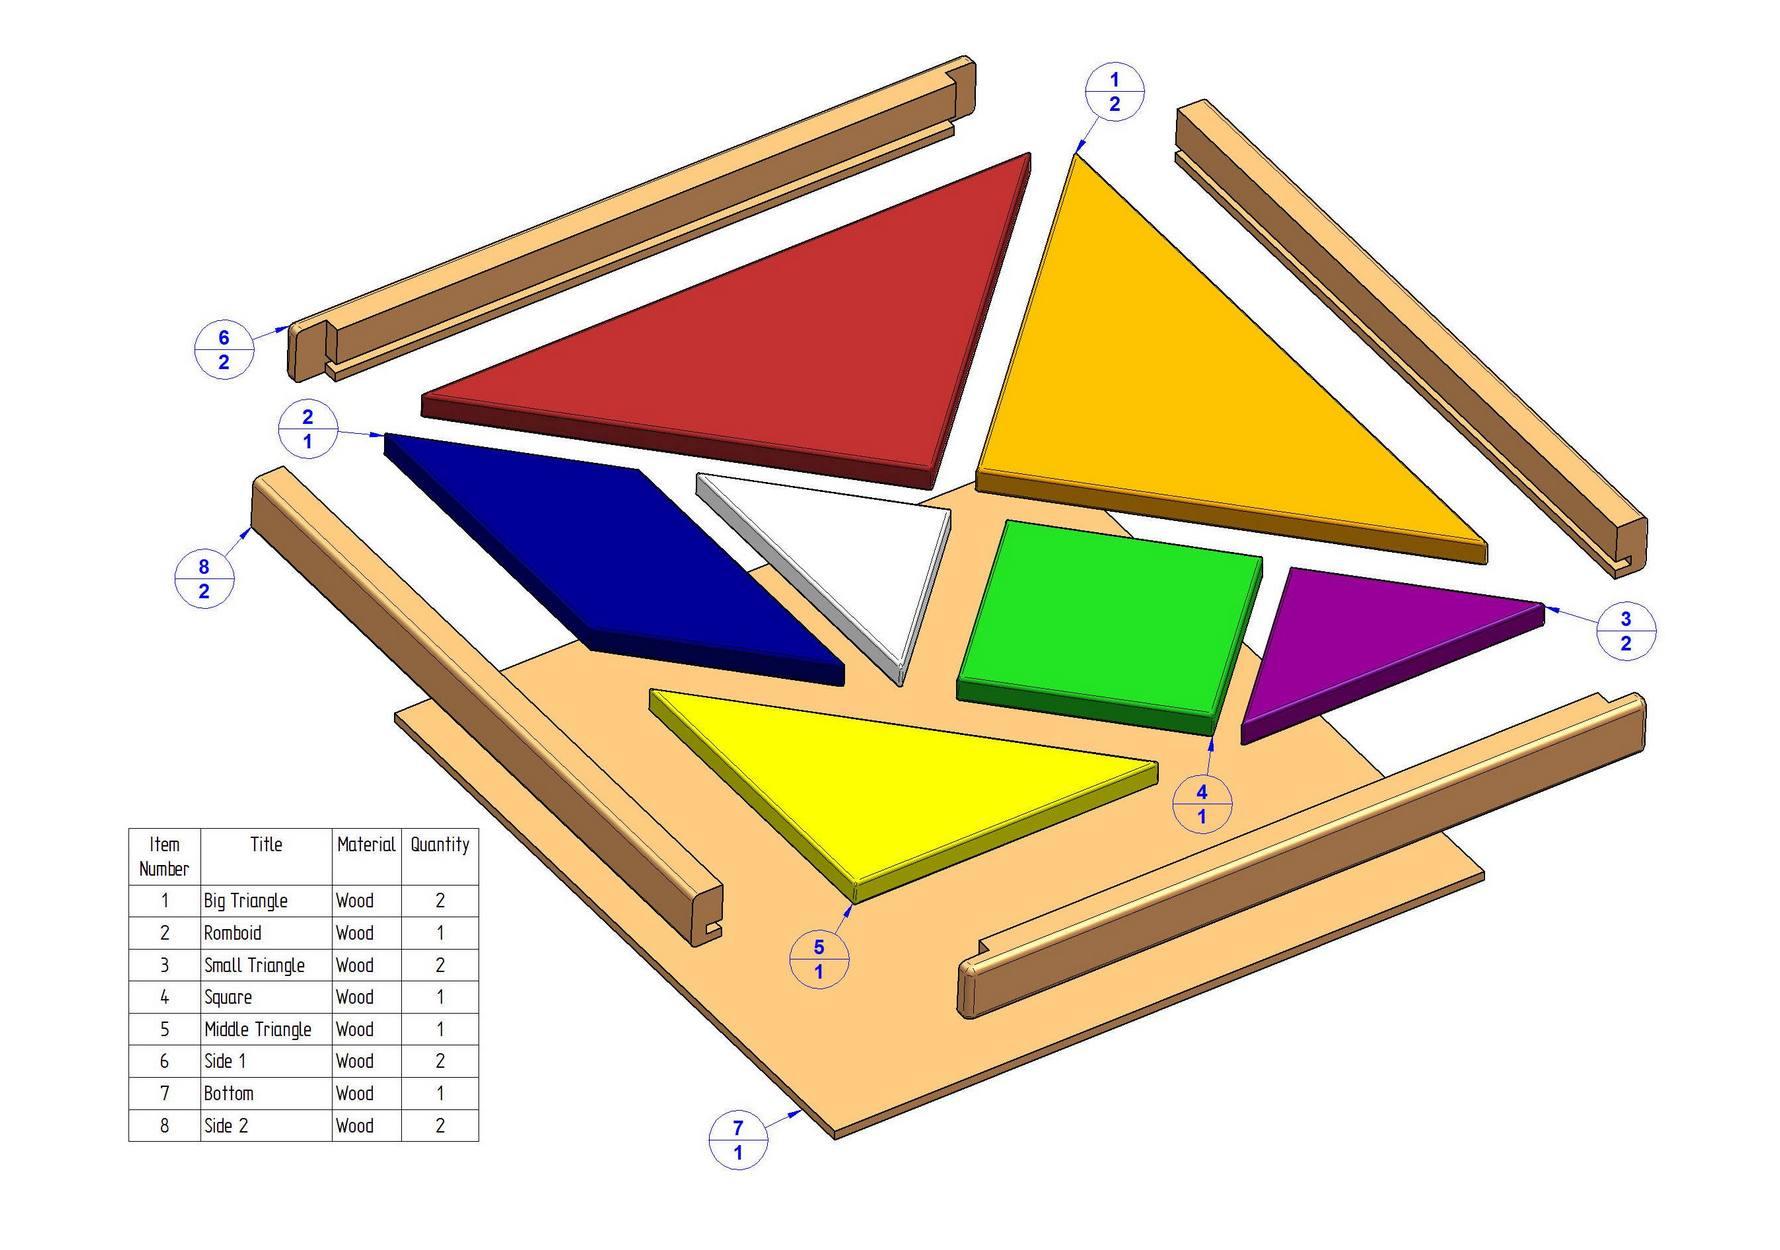 Tangram puzzle plan tangram puzzle plan parts list ccuart Image collections